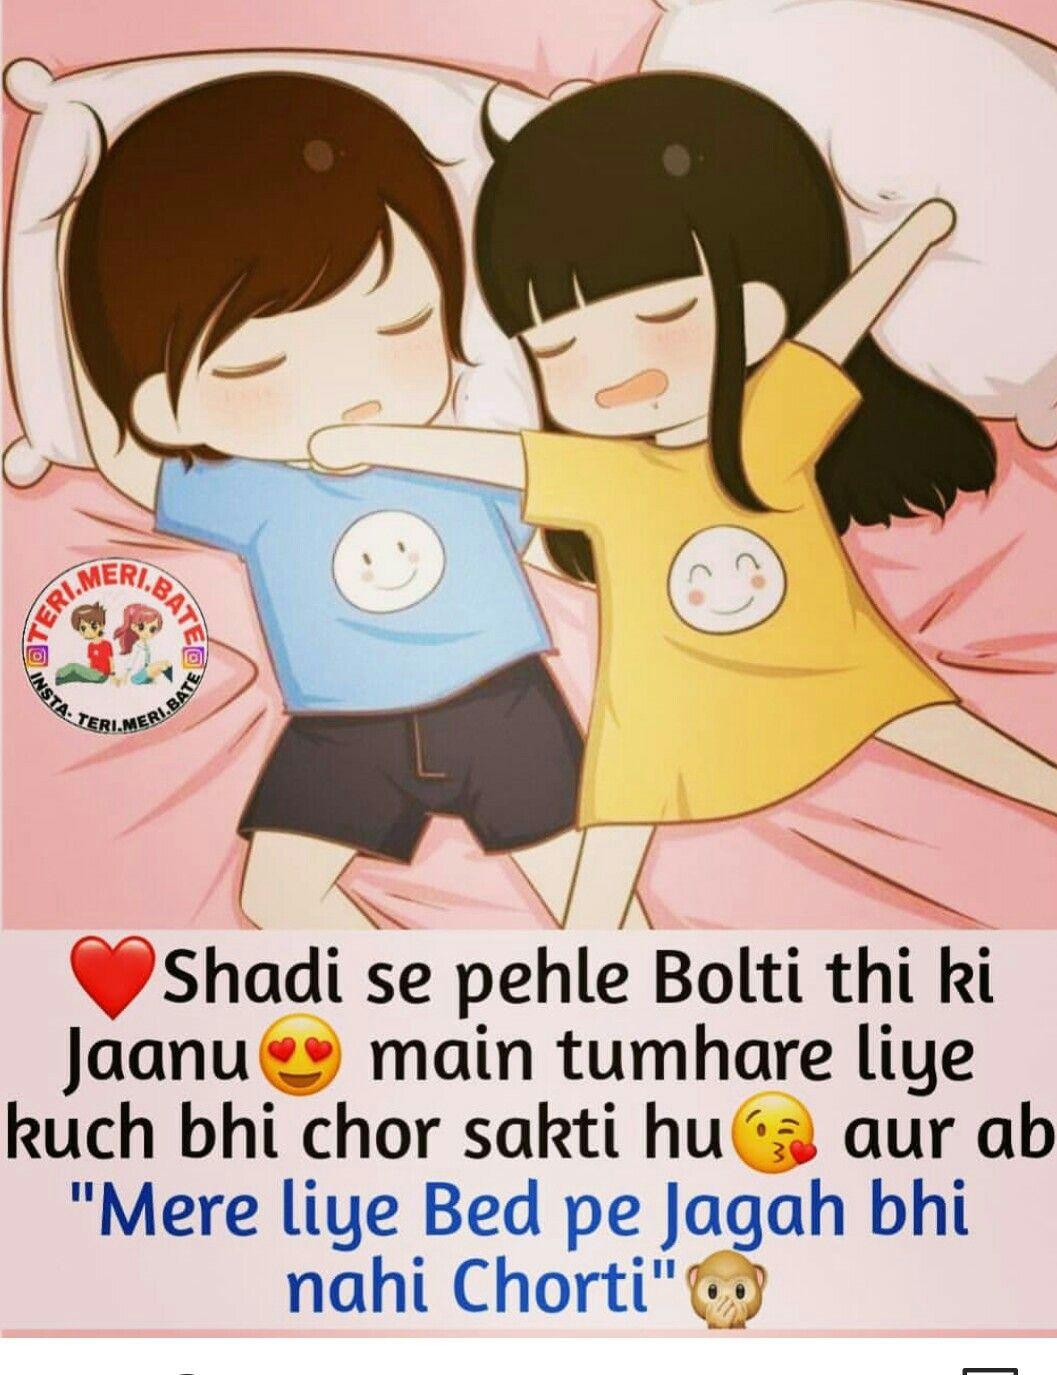 Acha Likha H Aur Funny Bhi H Na Shiv Haa Saloni Cartoon Love Quotes Funny Love Images Cute Love Quotes